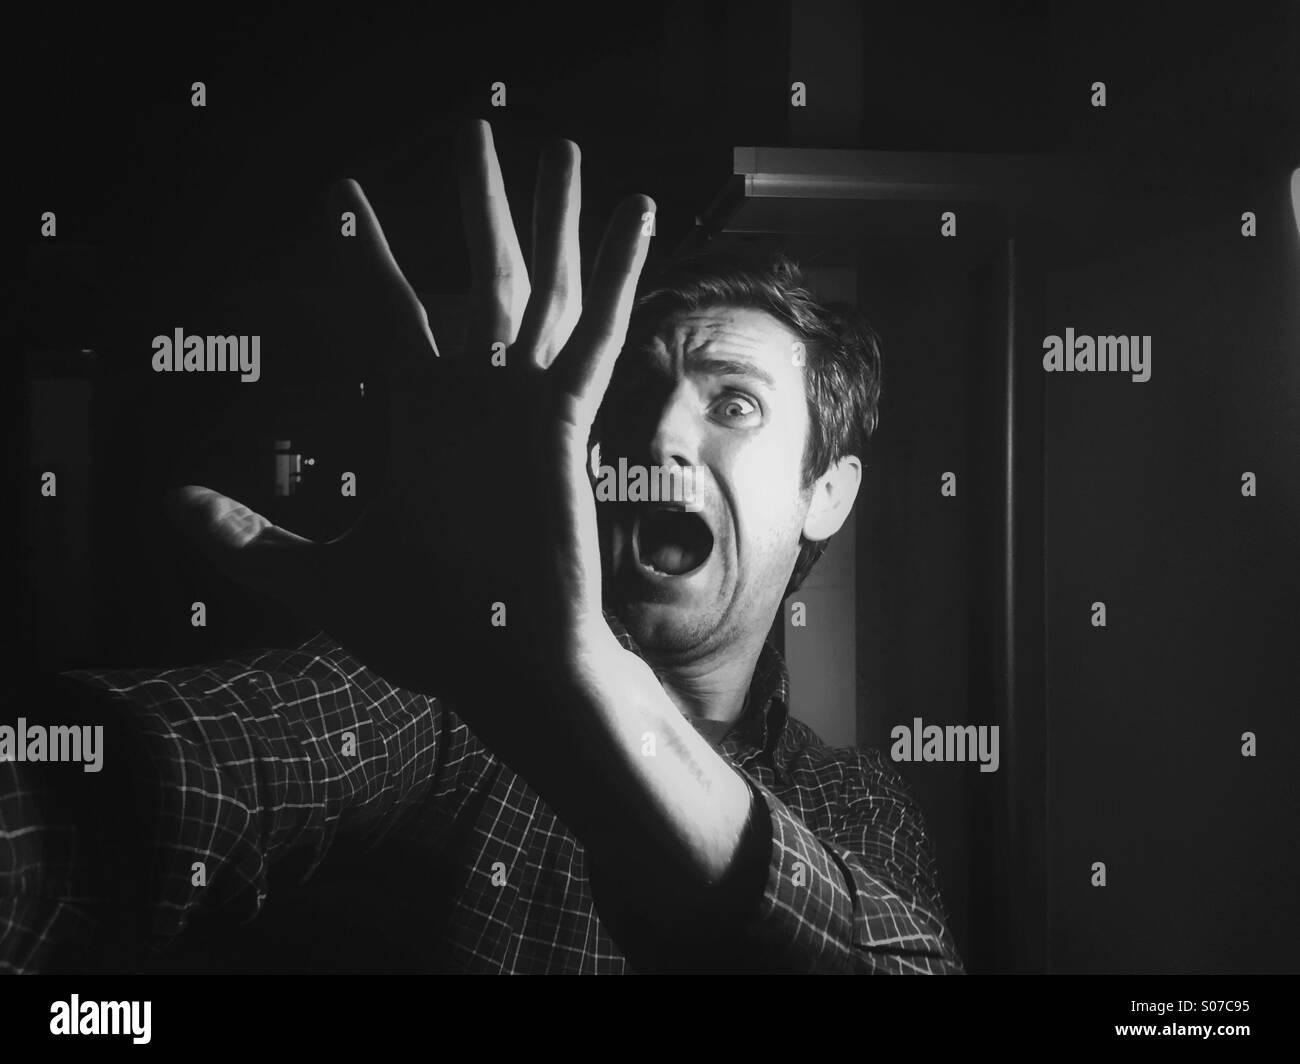 Scream Halloween, l'homme effrayé de quelque chose Photo Stock